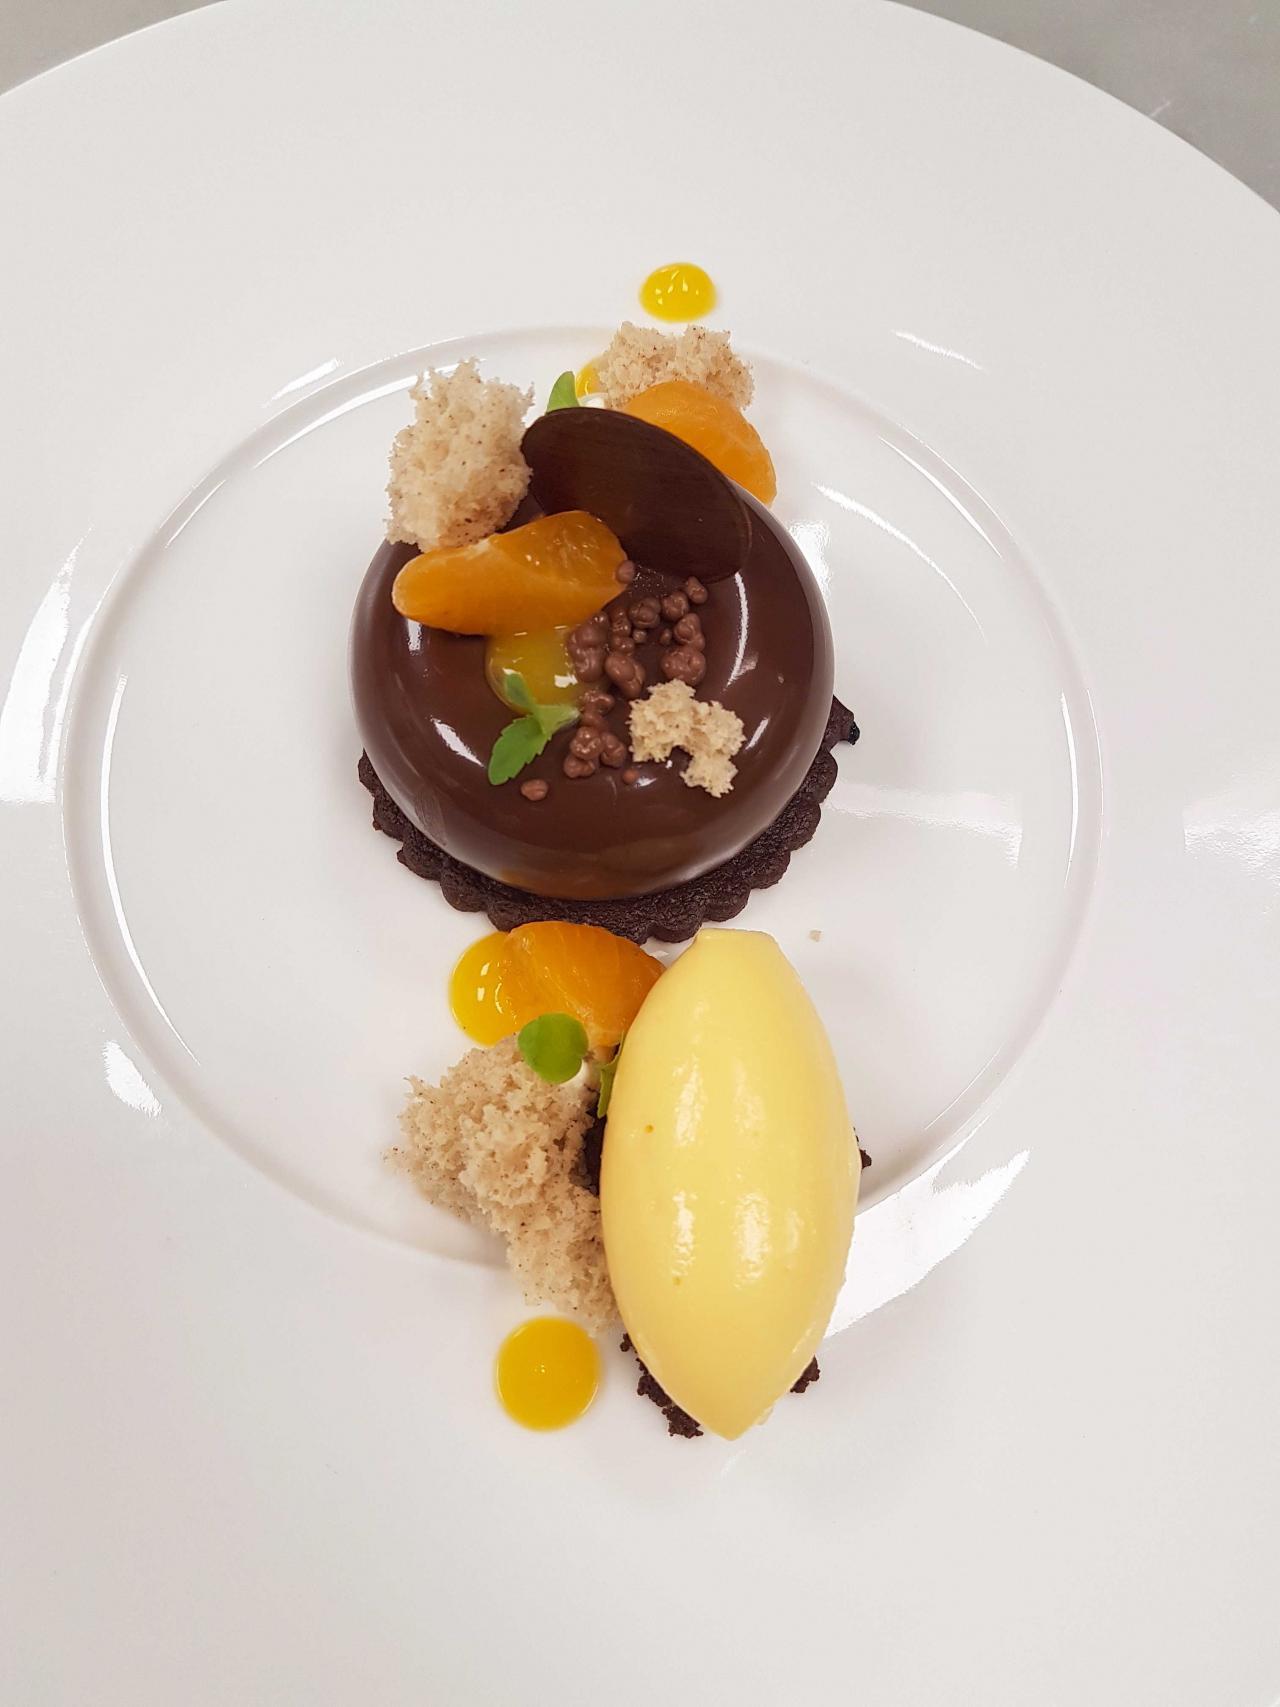 Dessert by Sarah Frankland